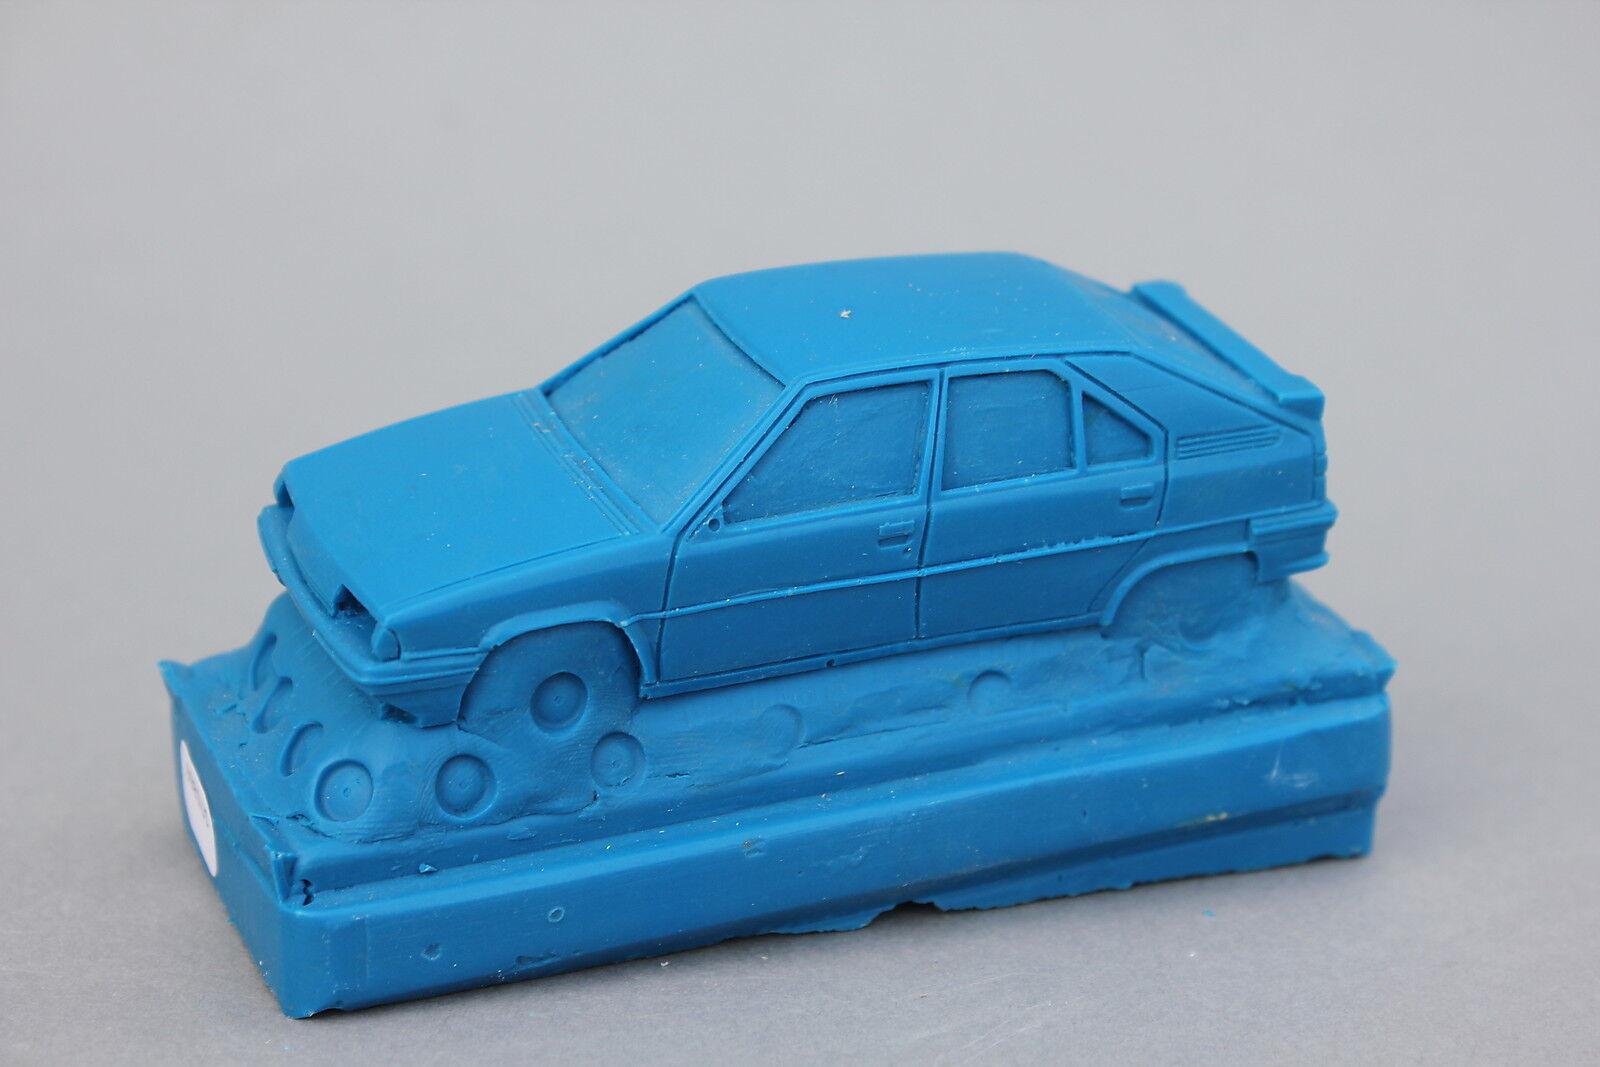 Sällsynta Die hkonsts Citroen Bx Sport Bil 1  43 Heco modellllerler fordon blå U